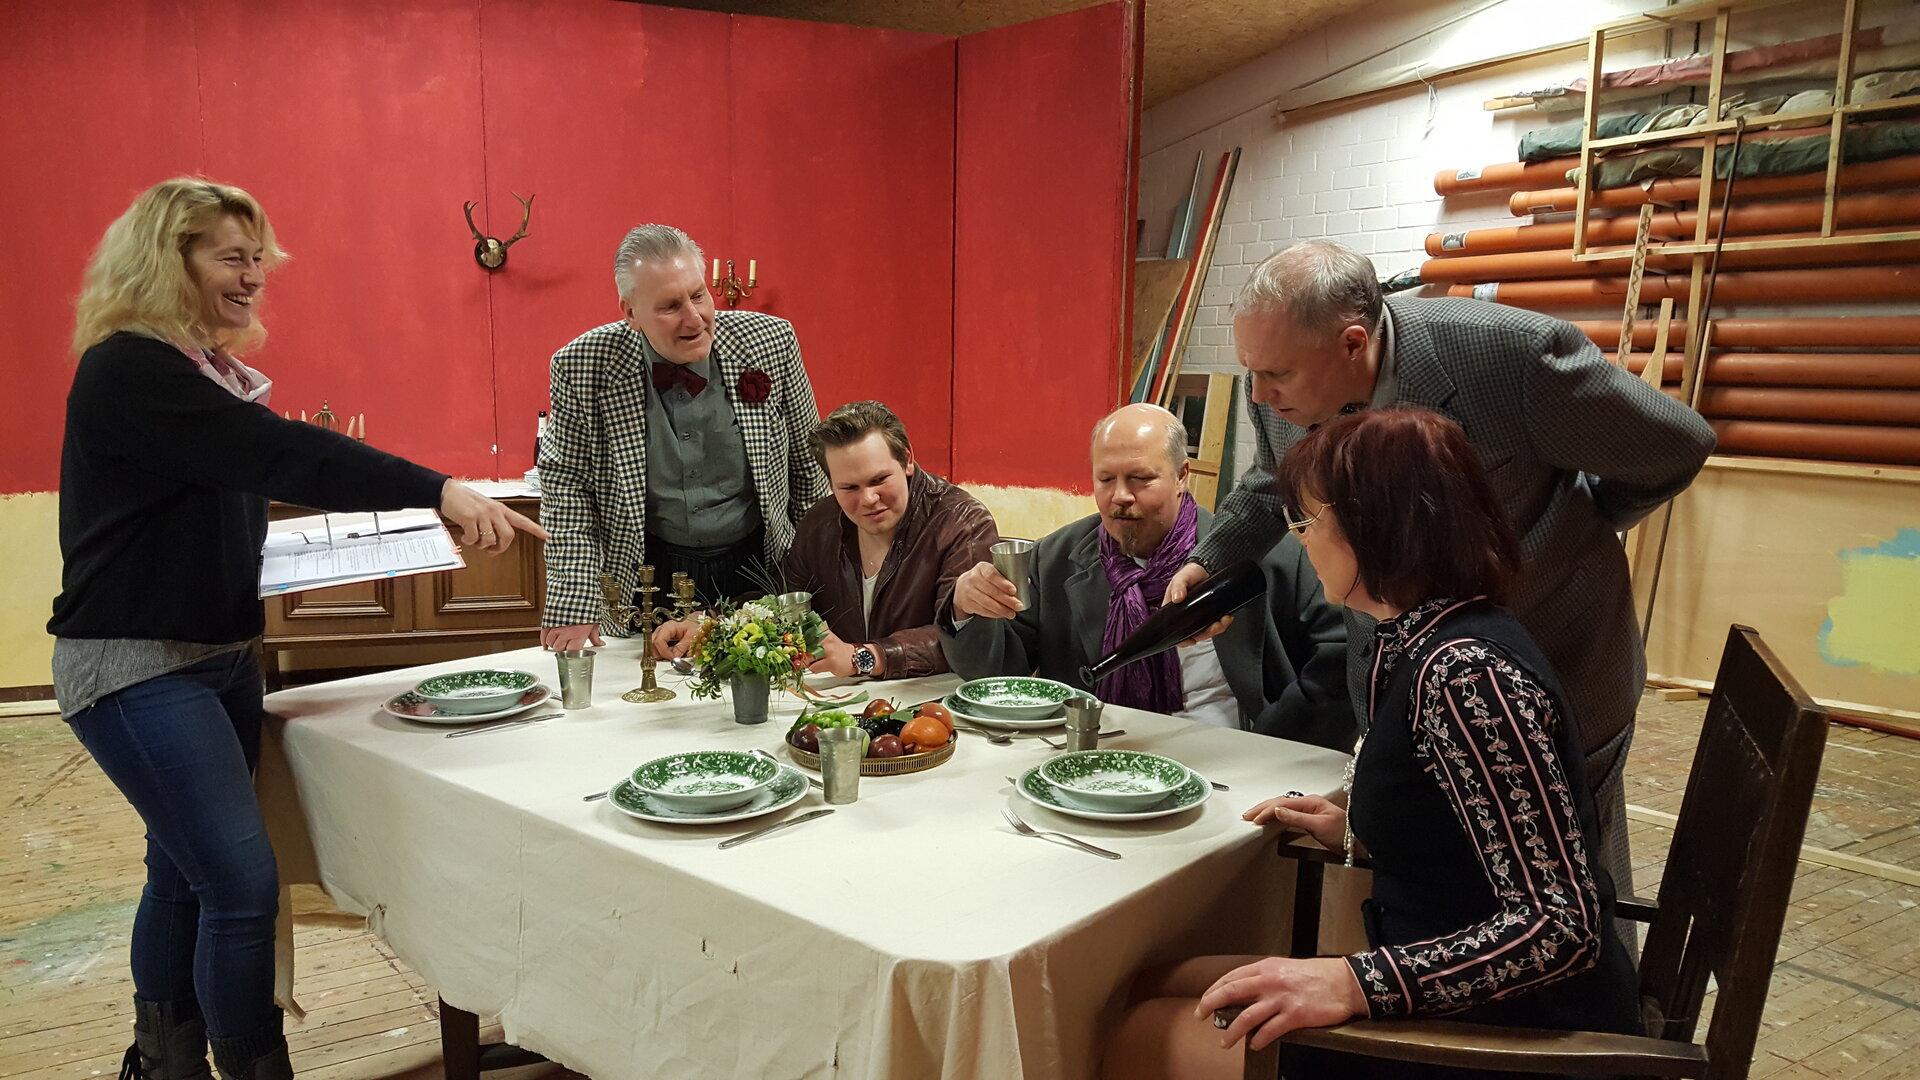 Teelke Budde (links) gibt letzte Regieanweisungen an Andree Uphoff, Malte Tönjes, Dieter Hattermann, Hero Kruse und Heike Müller-Feldmann.